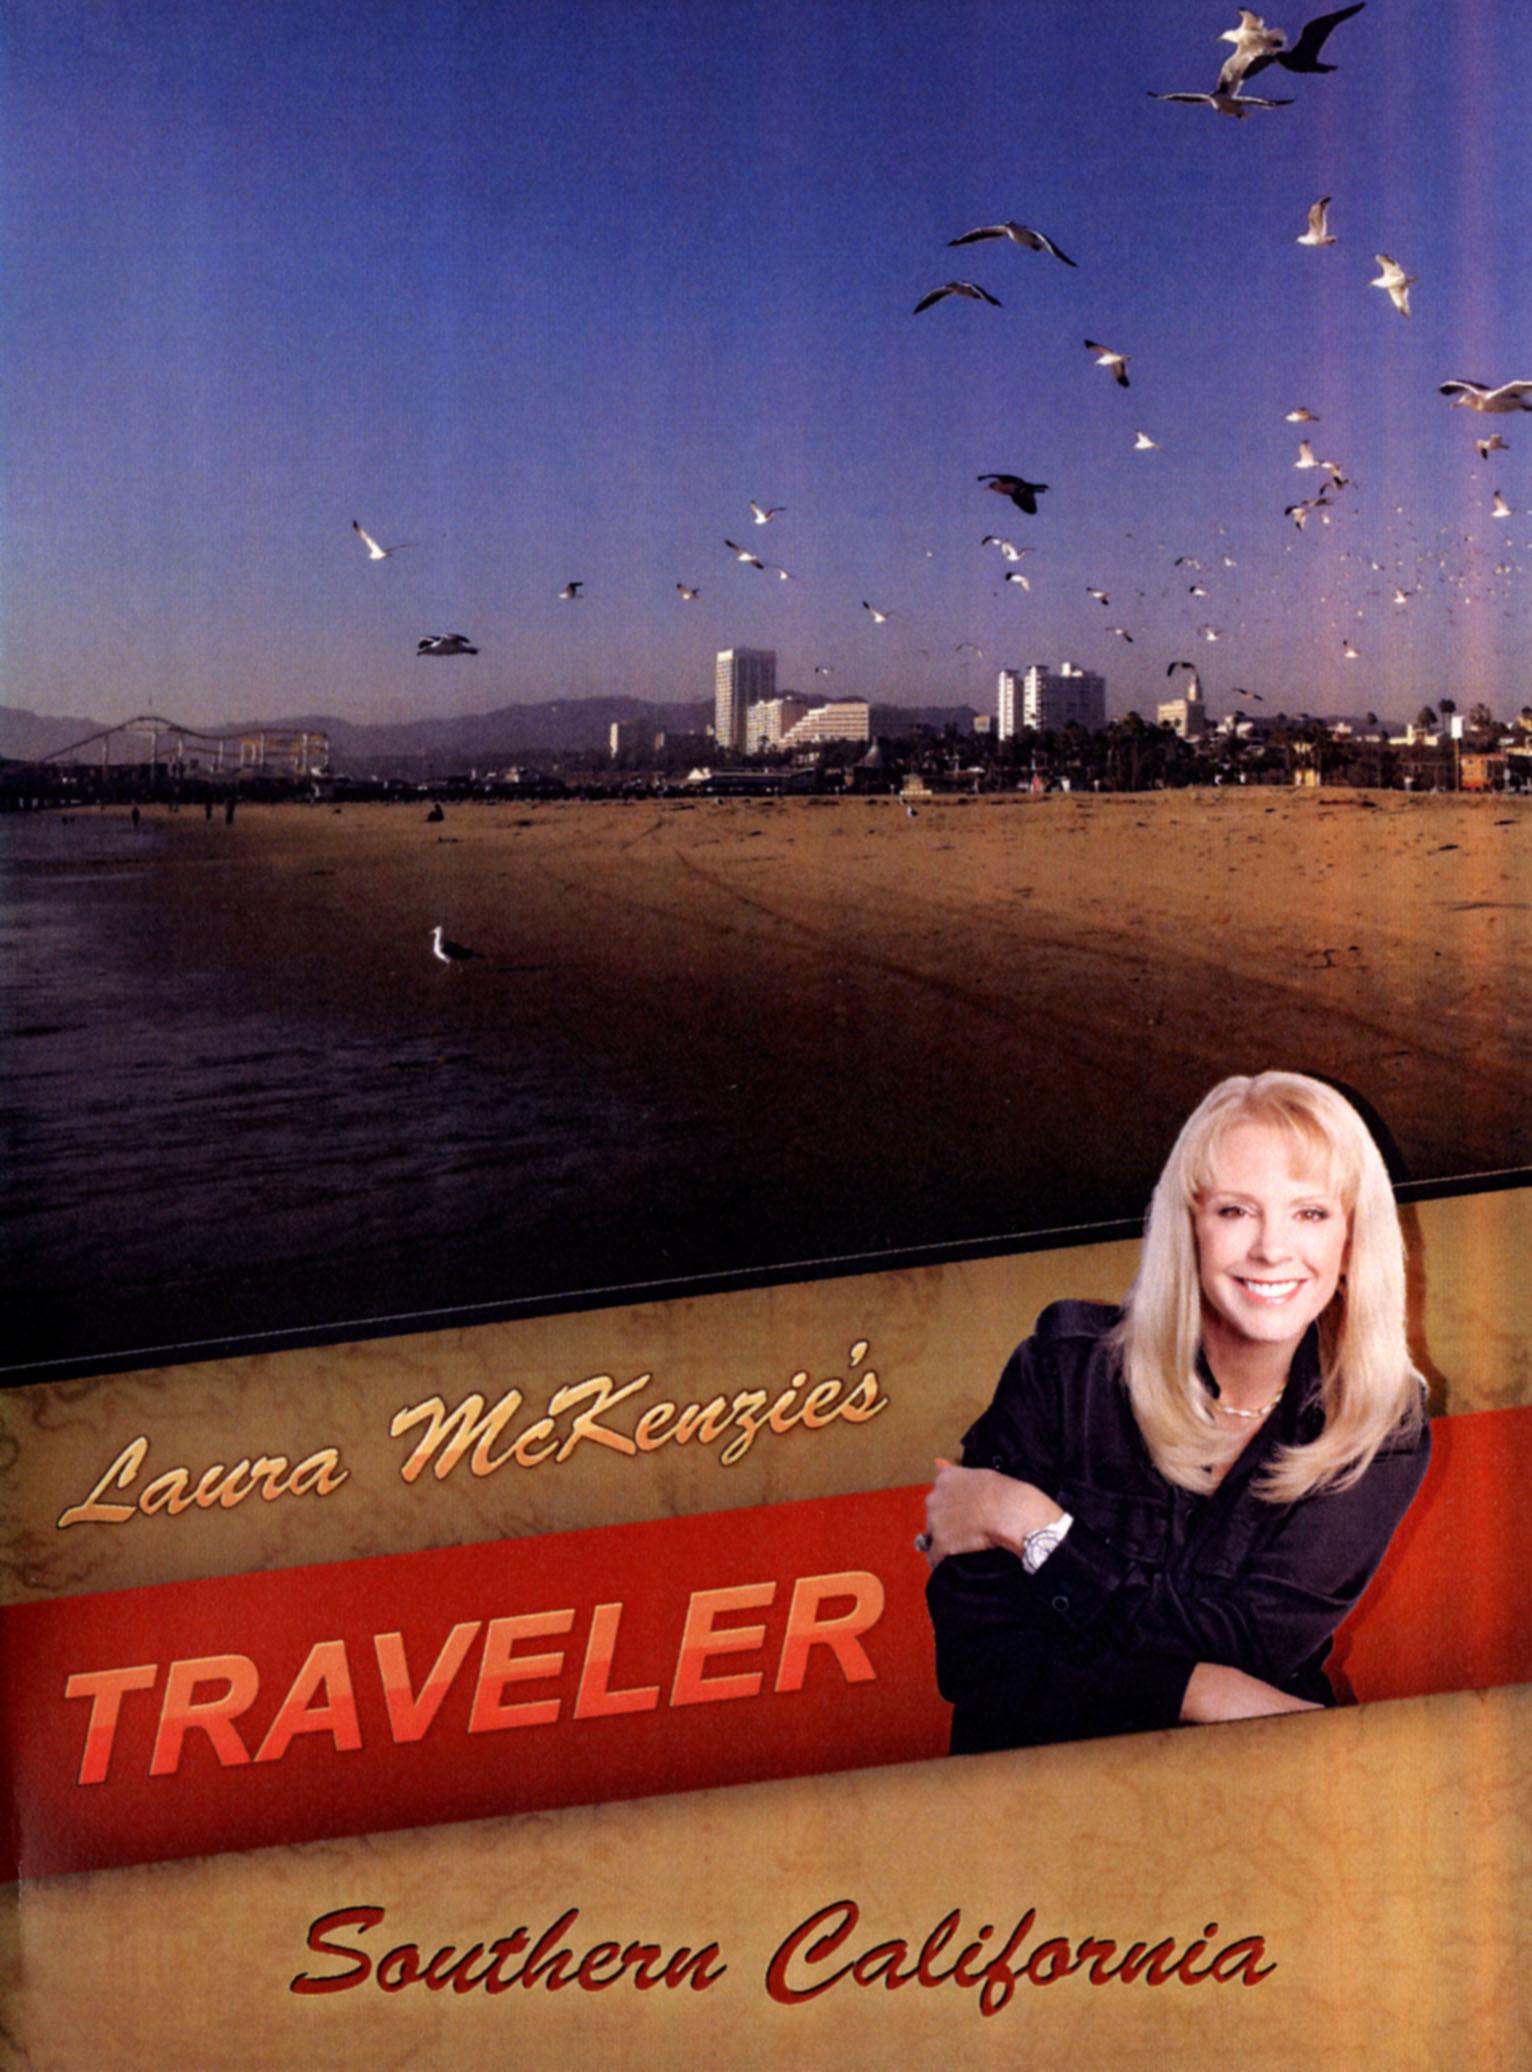 Laura McKenzie's Traveler: Southern California